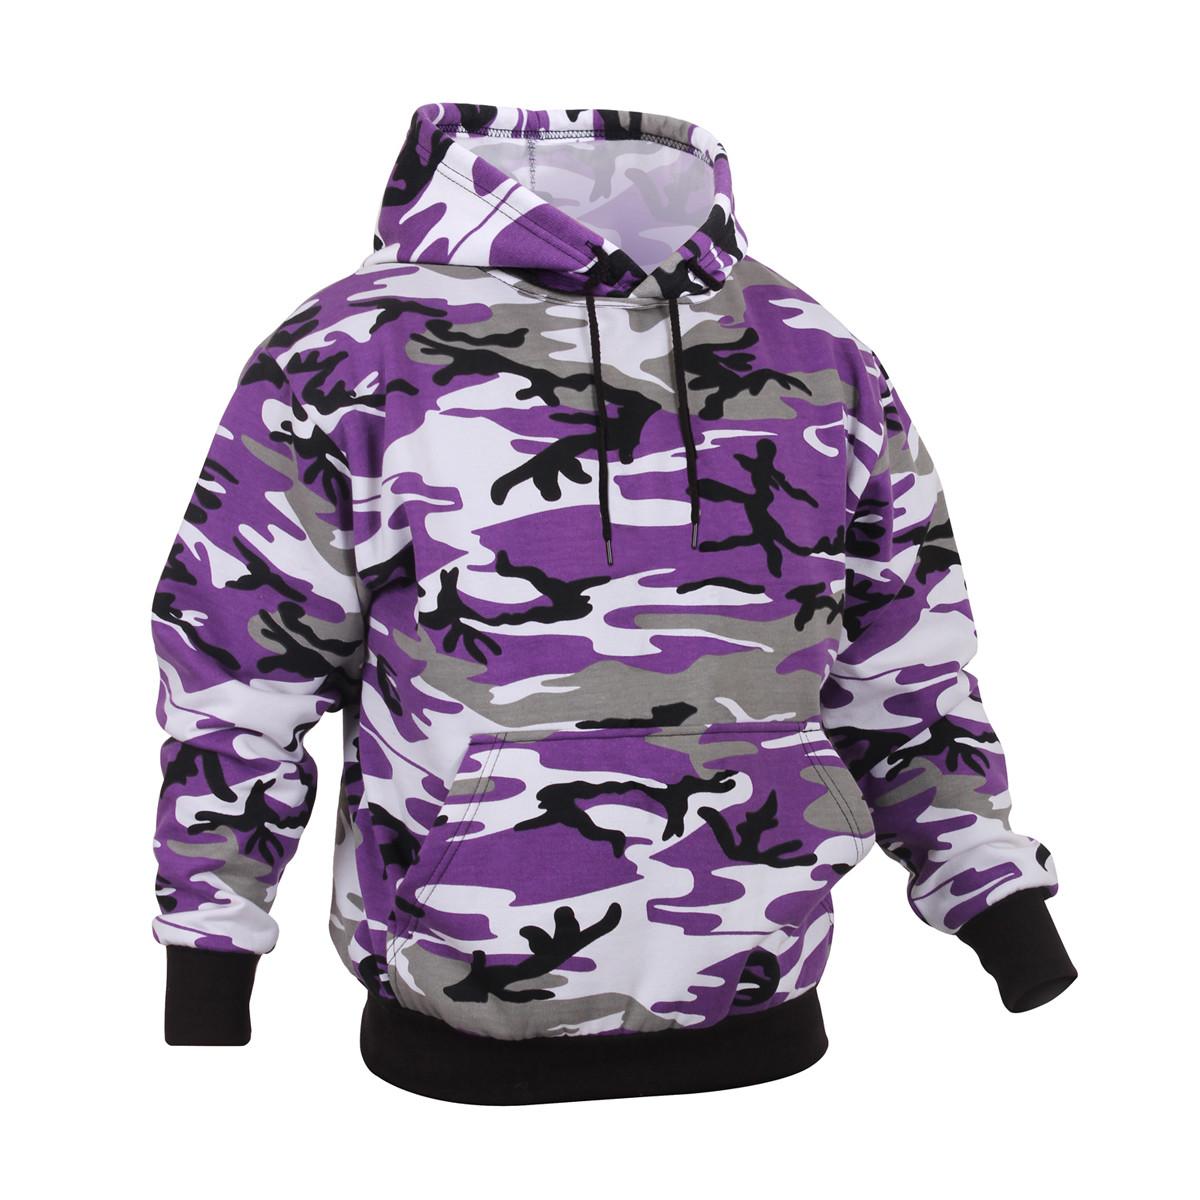 c8817e9b361166 Shop Purple Camo Pullover Hooded Sweatshirts - Fatigues Army Navy Gear